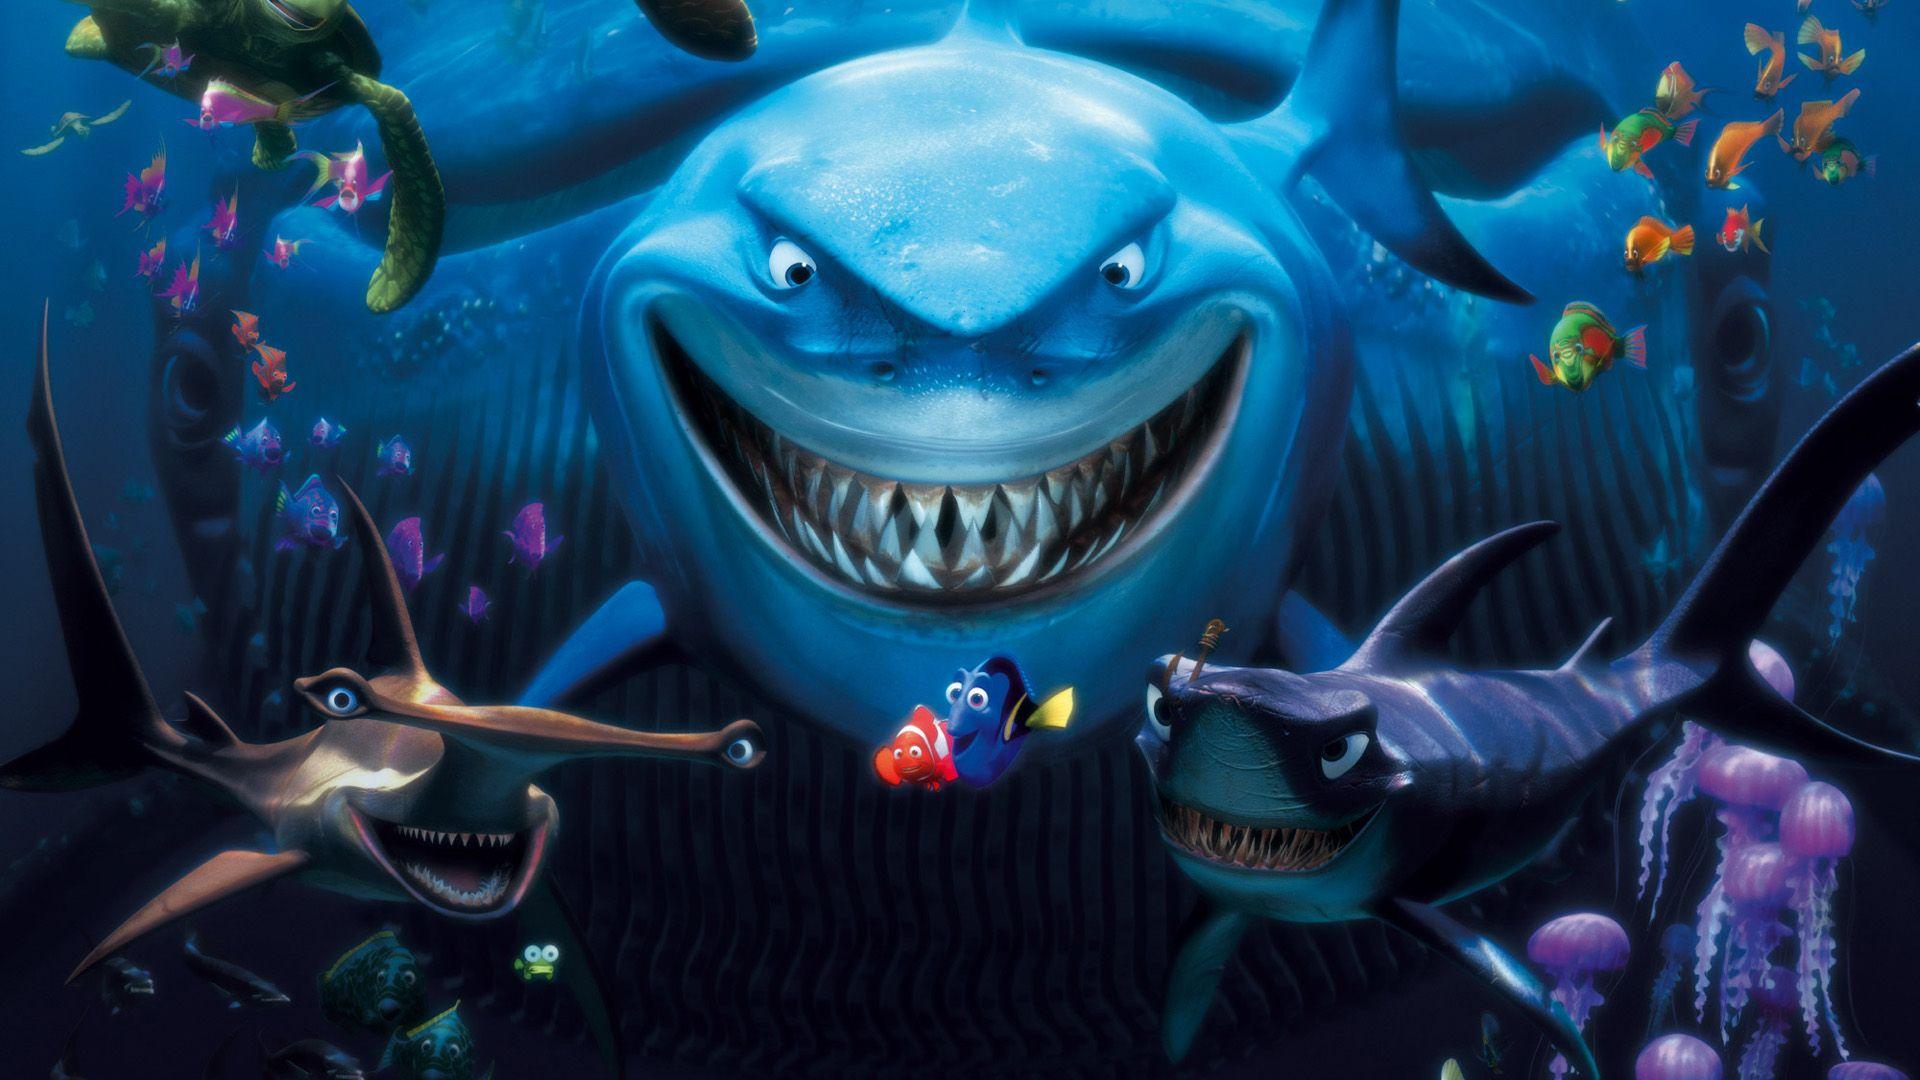 Fish tank nemo - Fish Tank Nemo